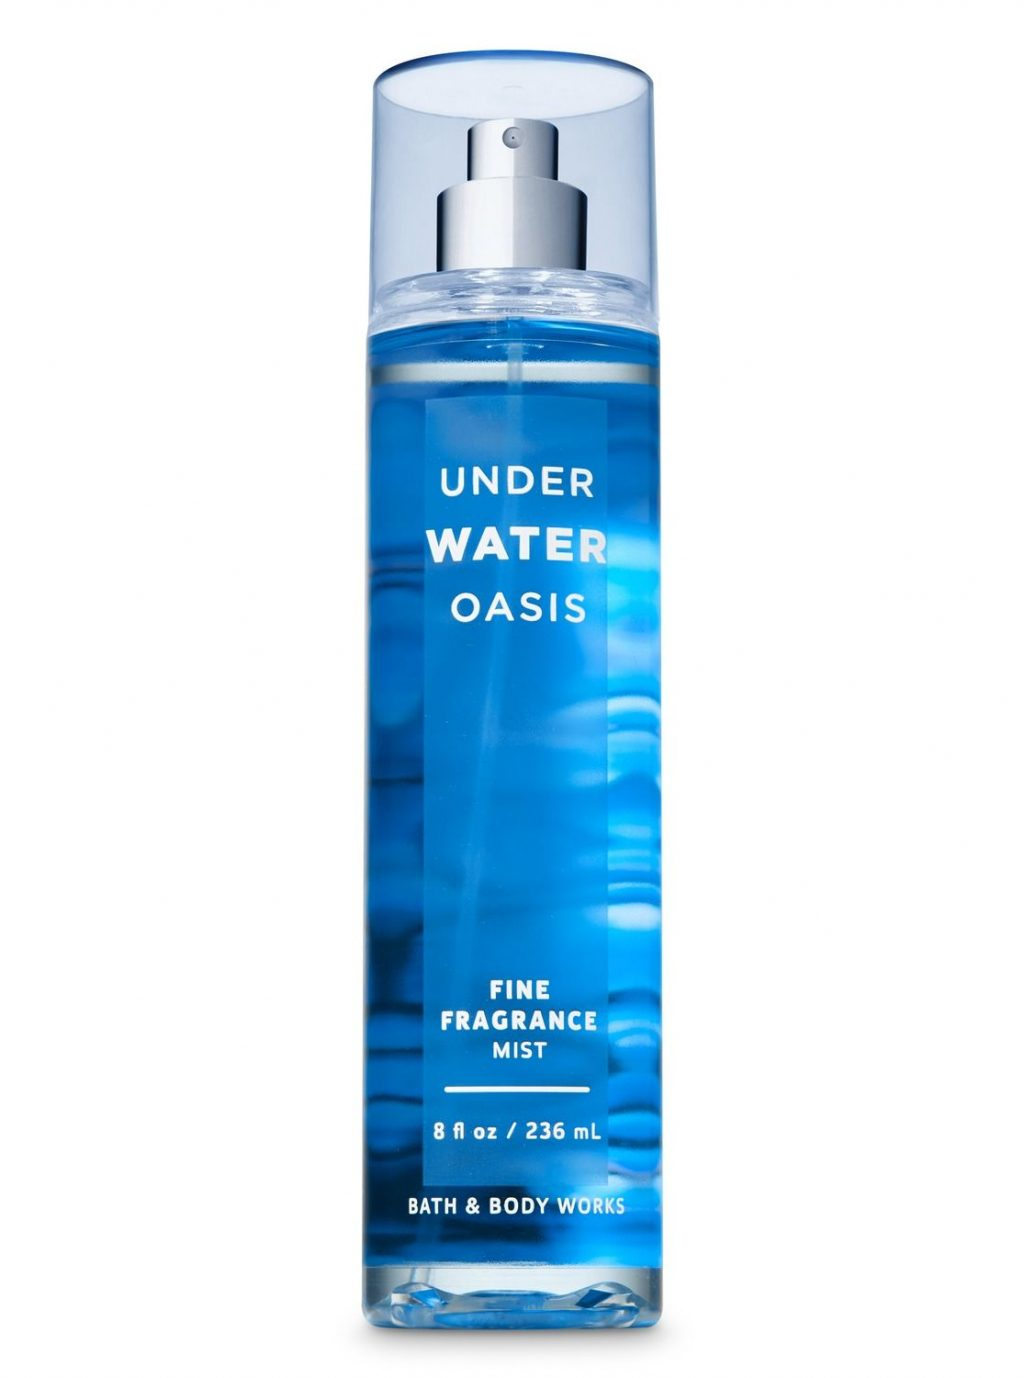 xịt thơm toàn thân Bath & Body Works Underwater Oasis